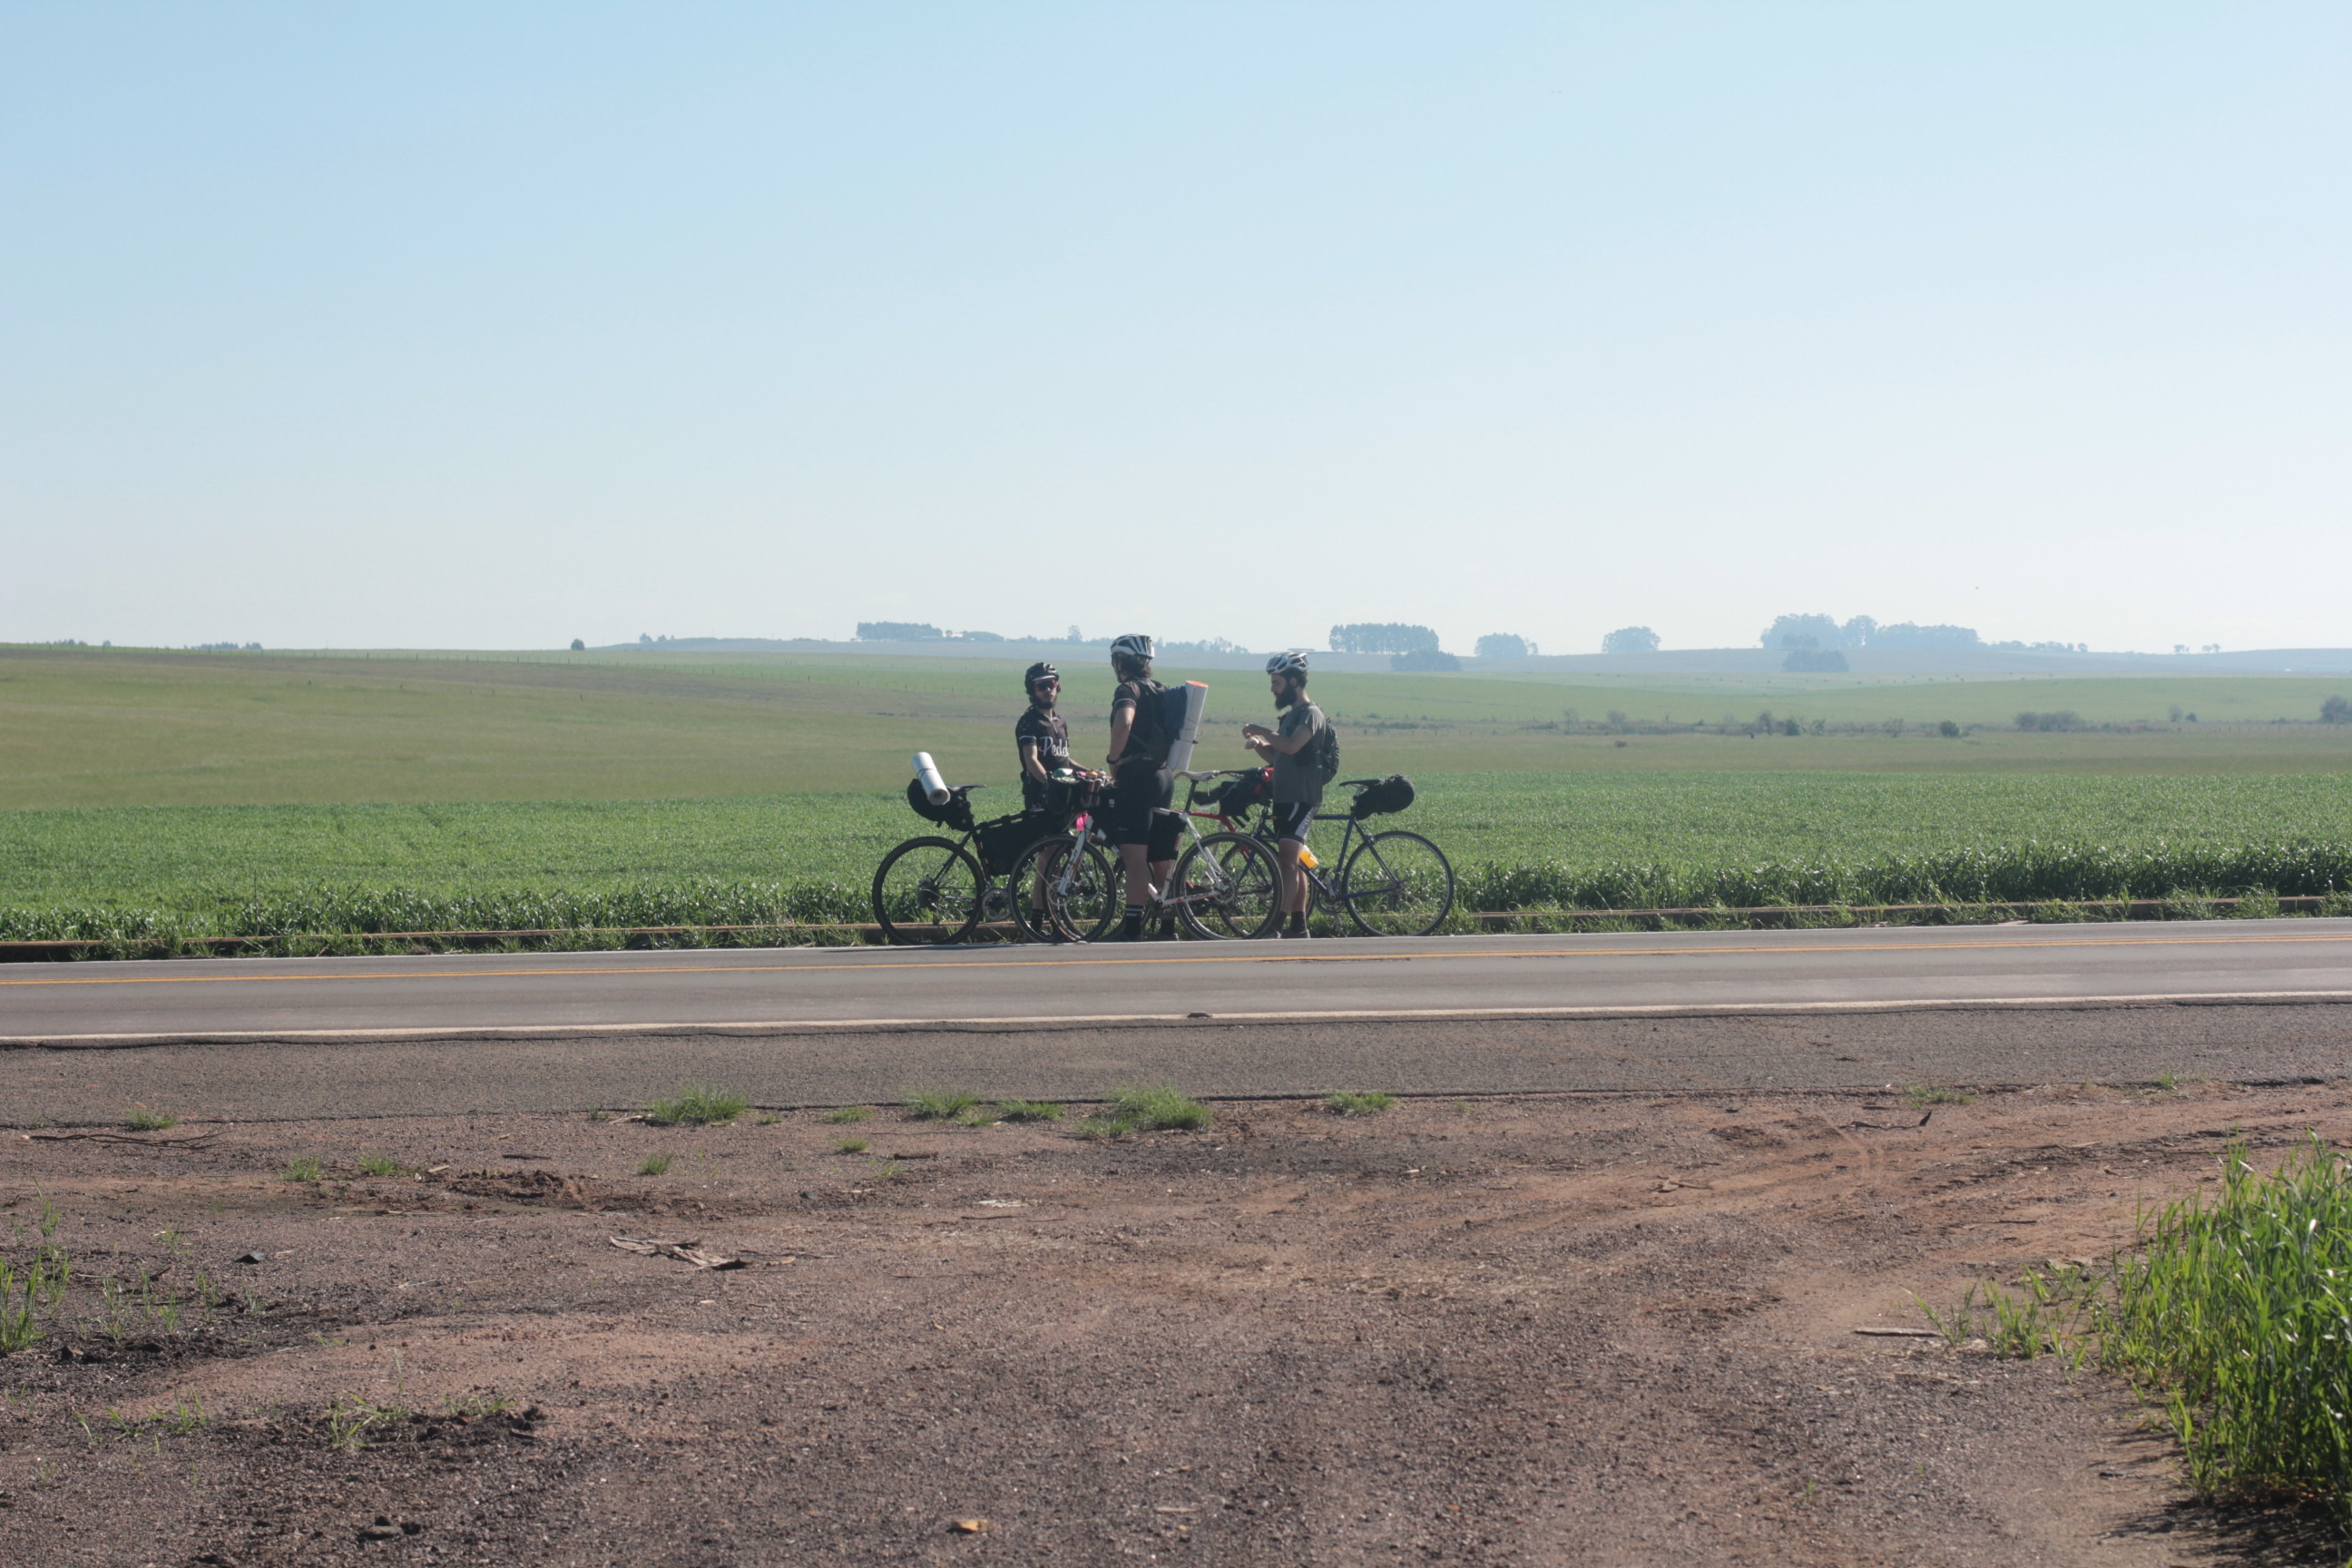 17-expresso-patagonia-porto-alegre-sao-gabriel-bike-packing